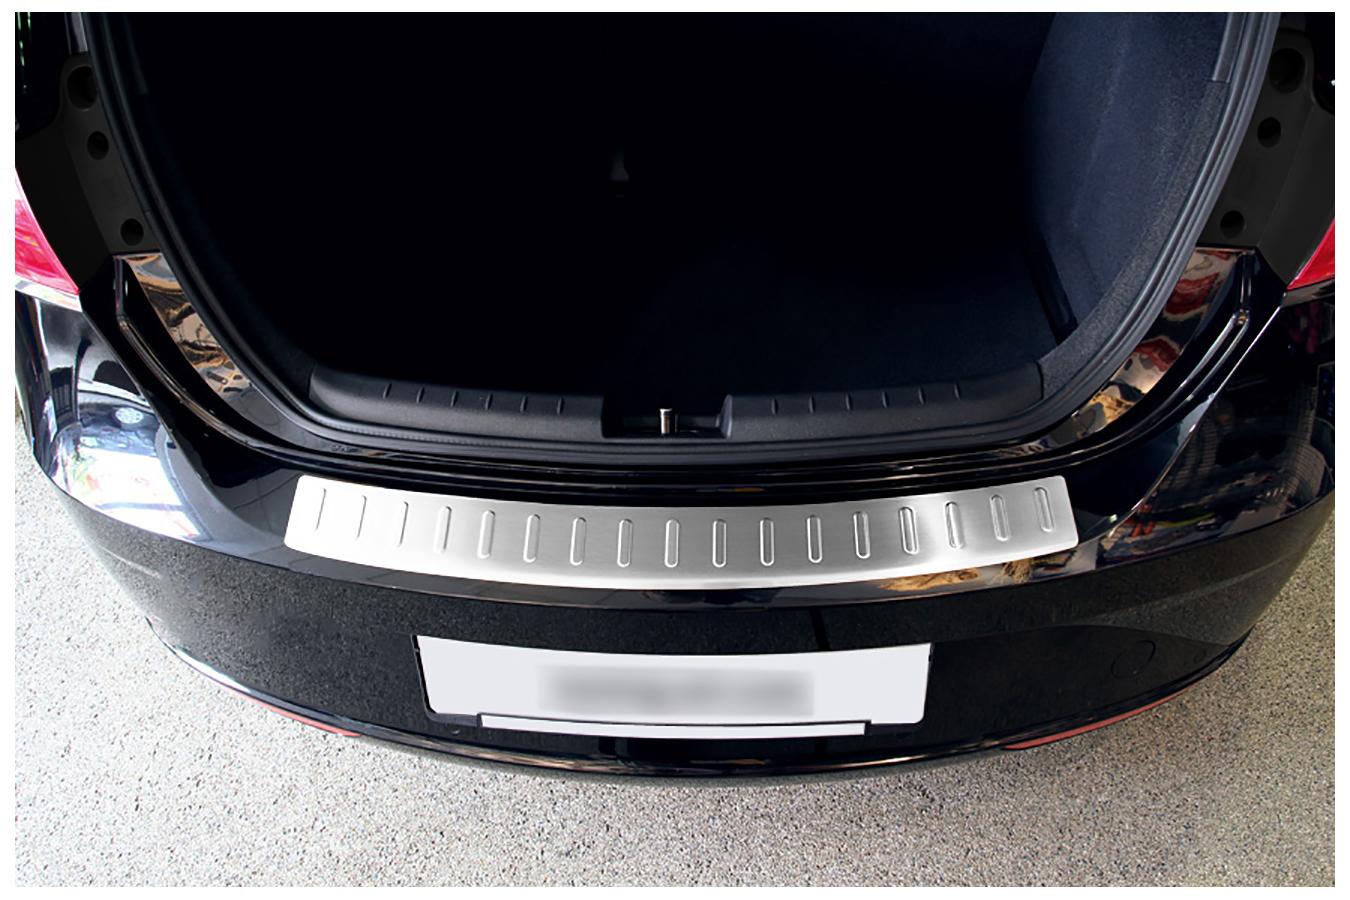 Acero inoxidable parachoques protección para VW Golf 6 BJ. 2008-2012